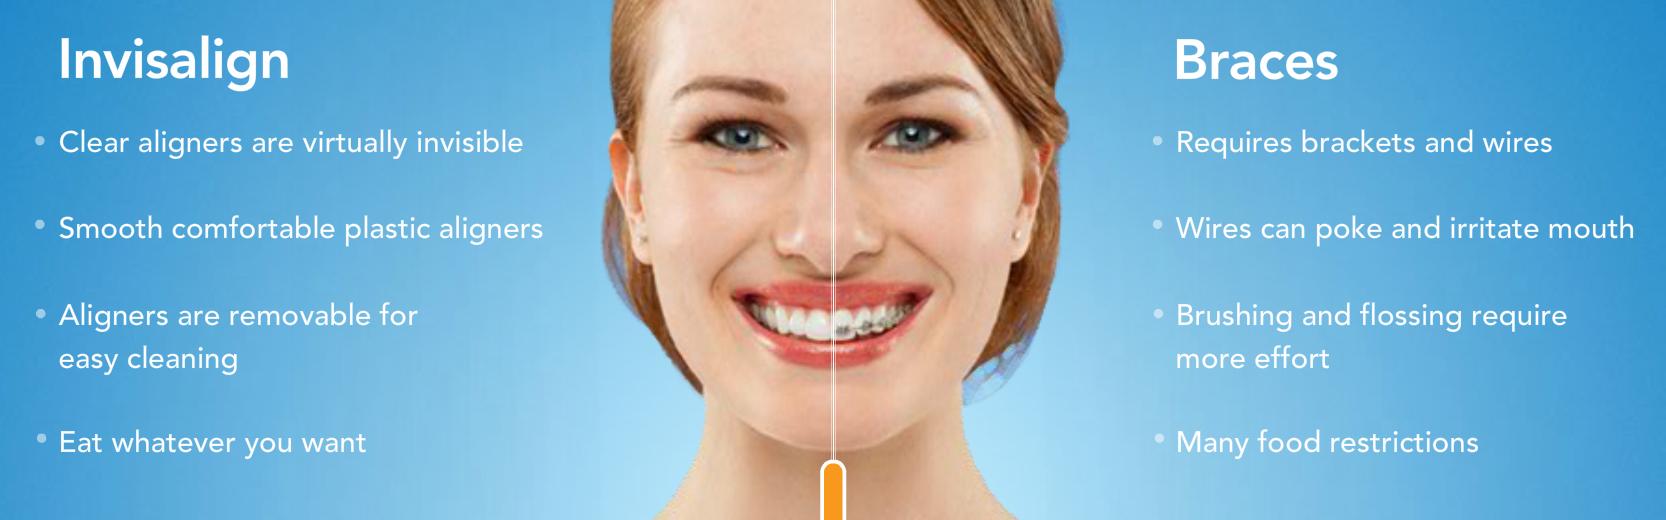 Invisalign clear braces Grand Rapids - Straighten teeth ...